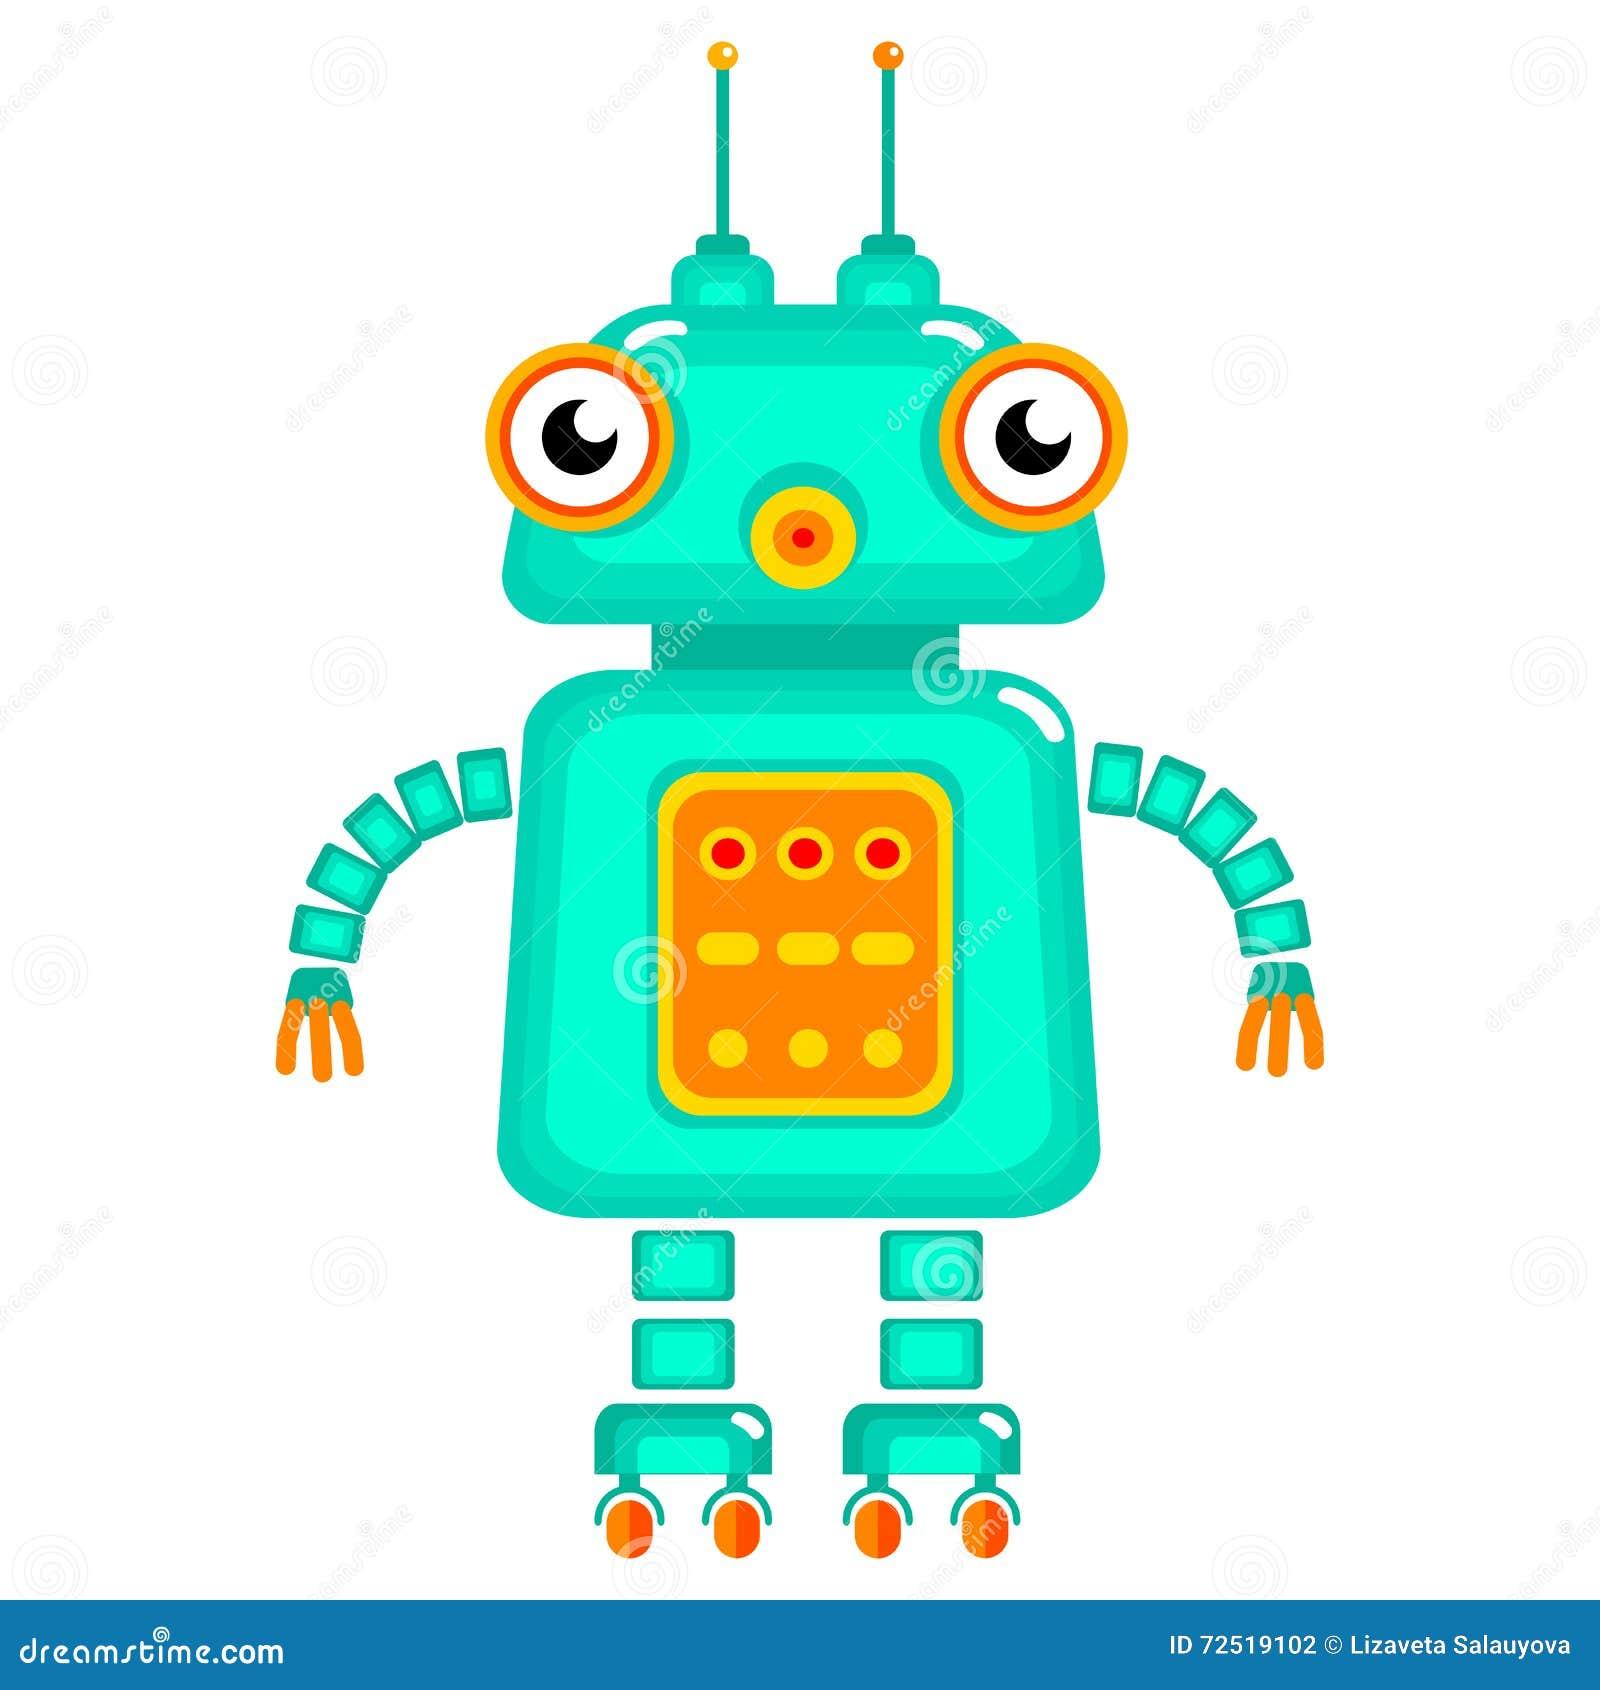 Cartoon Robot Toy : Cartoon cute robot stock vector illustration of cool